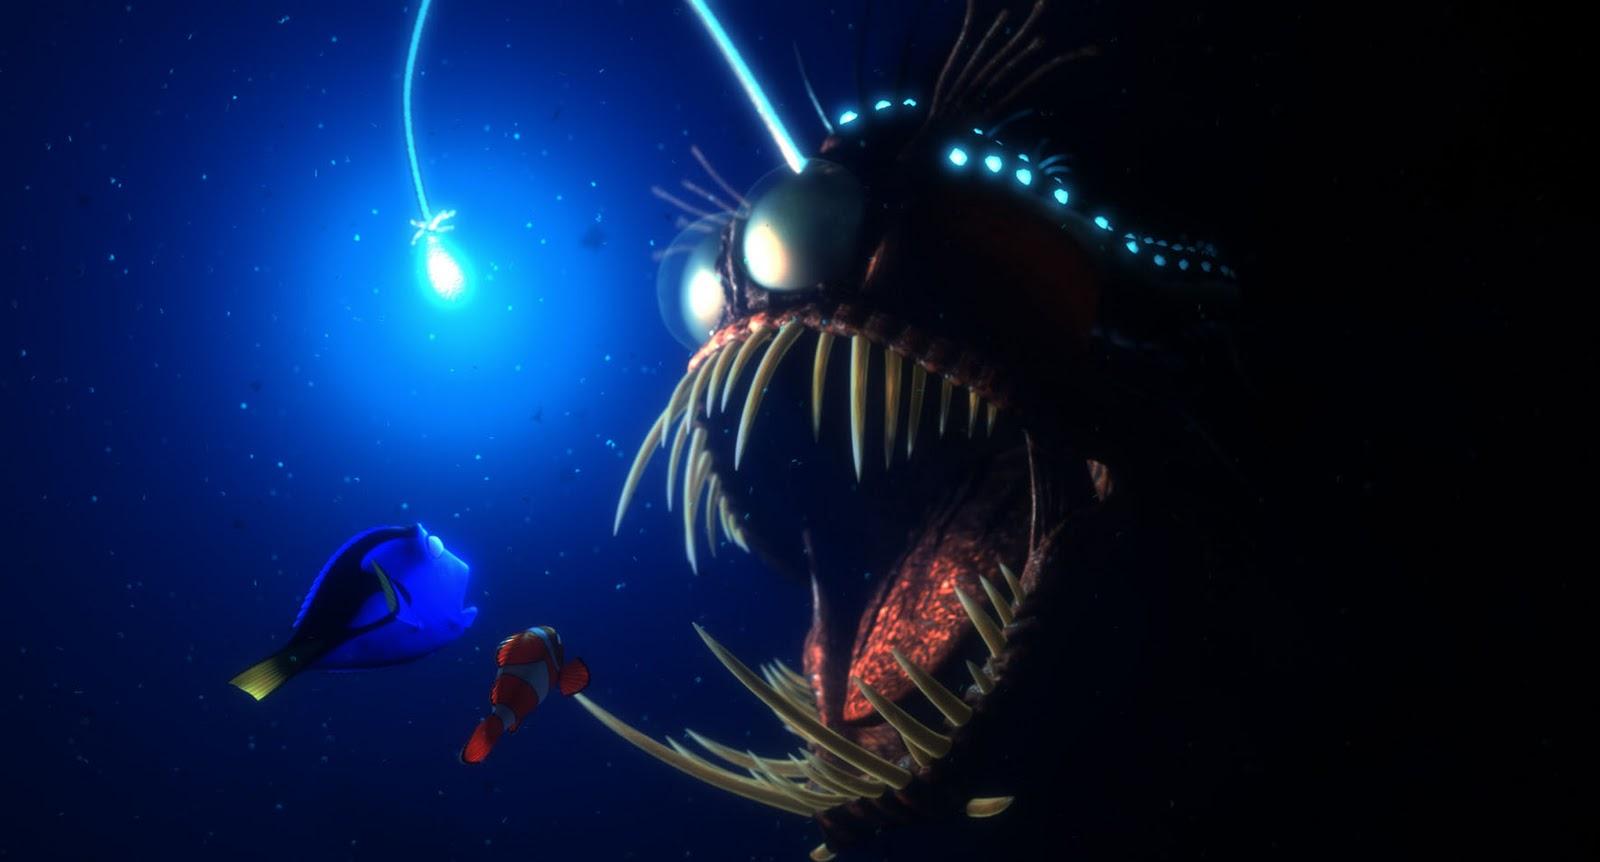 Disney Pixar Cars Wallpapers Free Download Finding Nemo 3d Movie Poster Hd Wallpapers Desktop Wallpaper